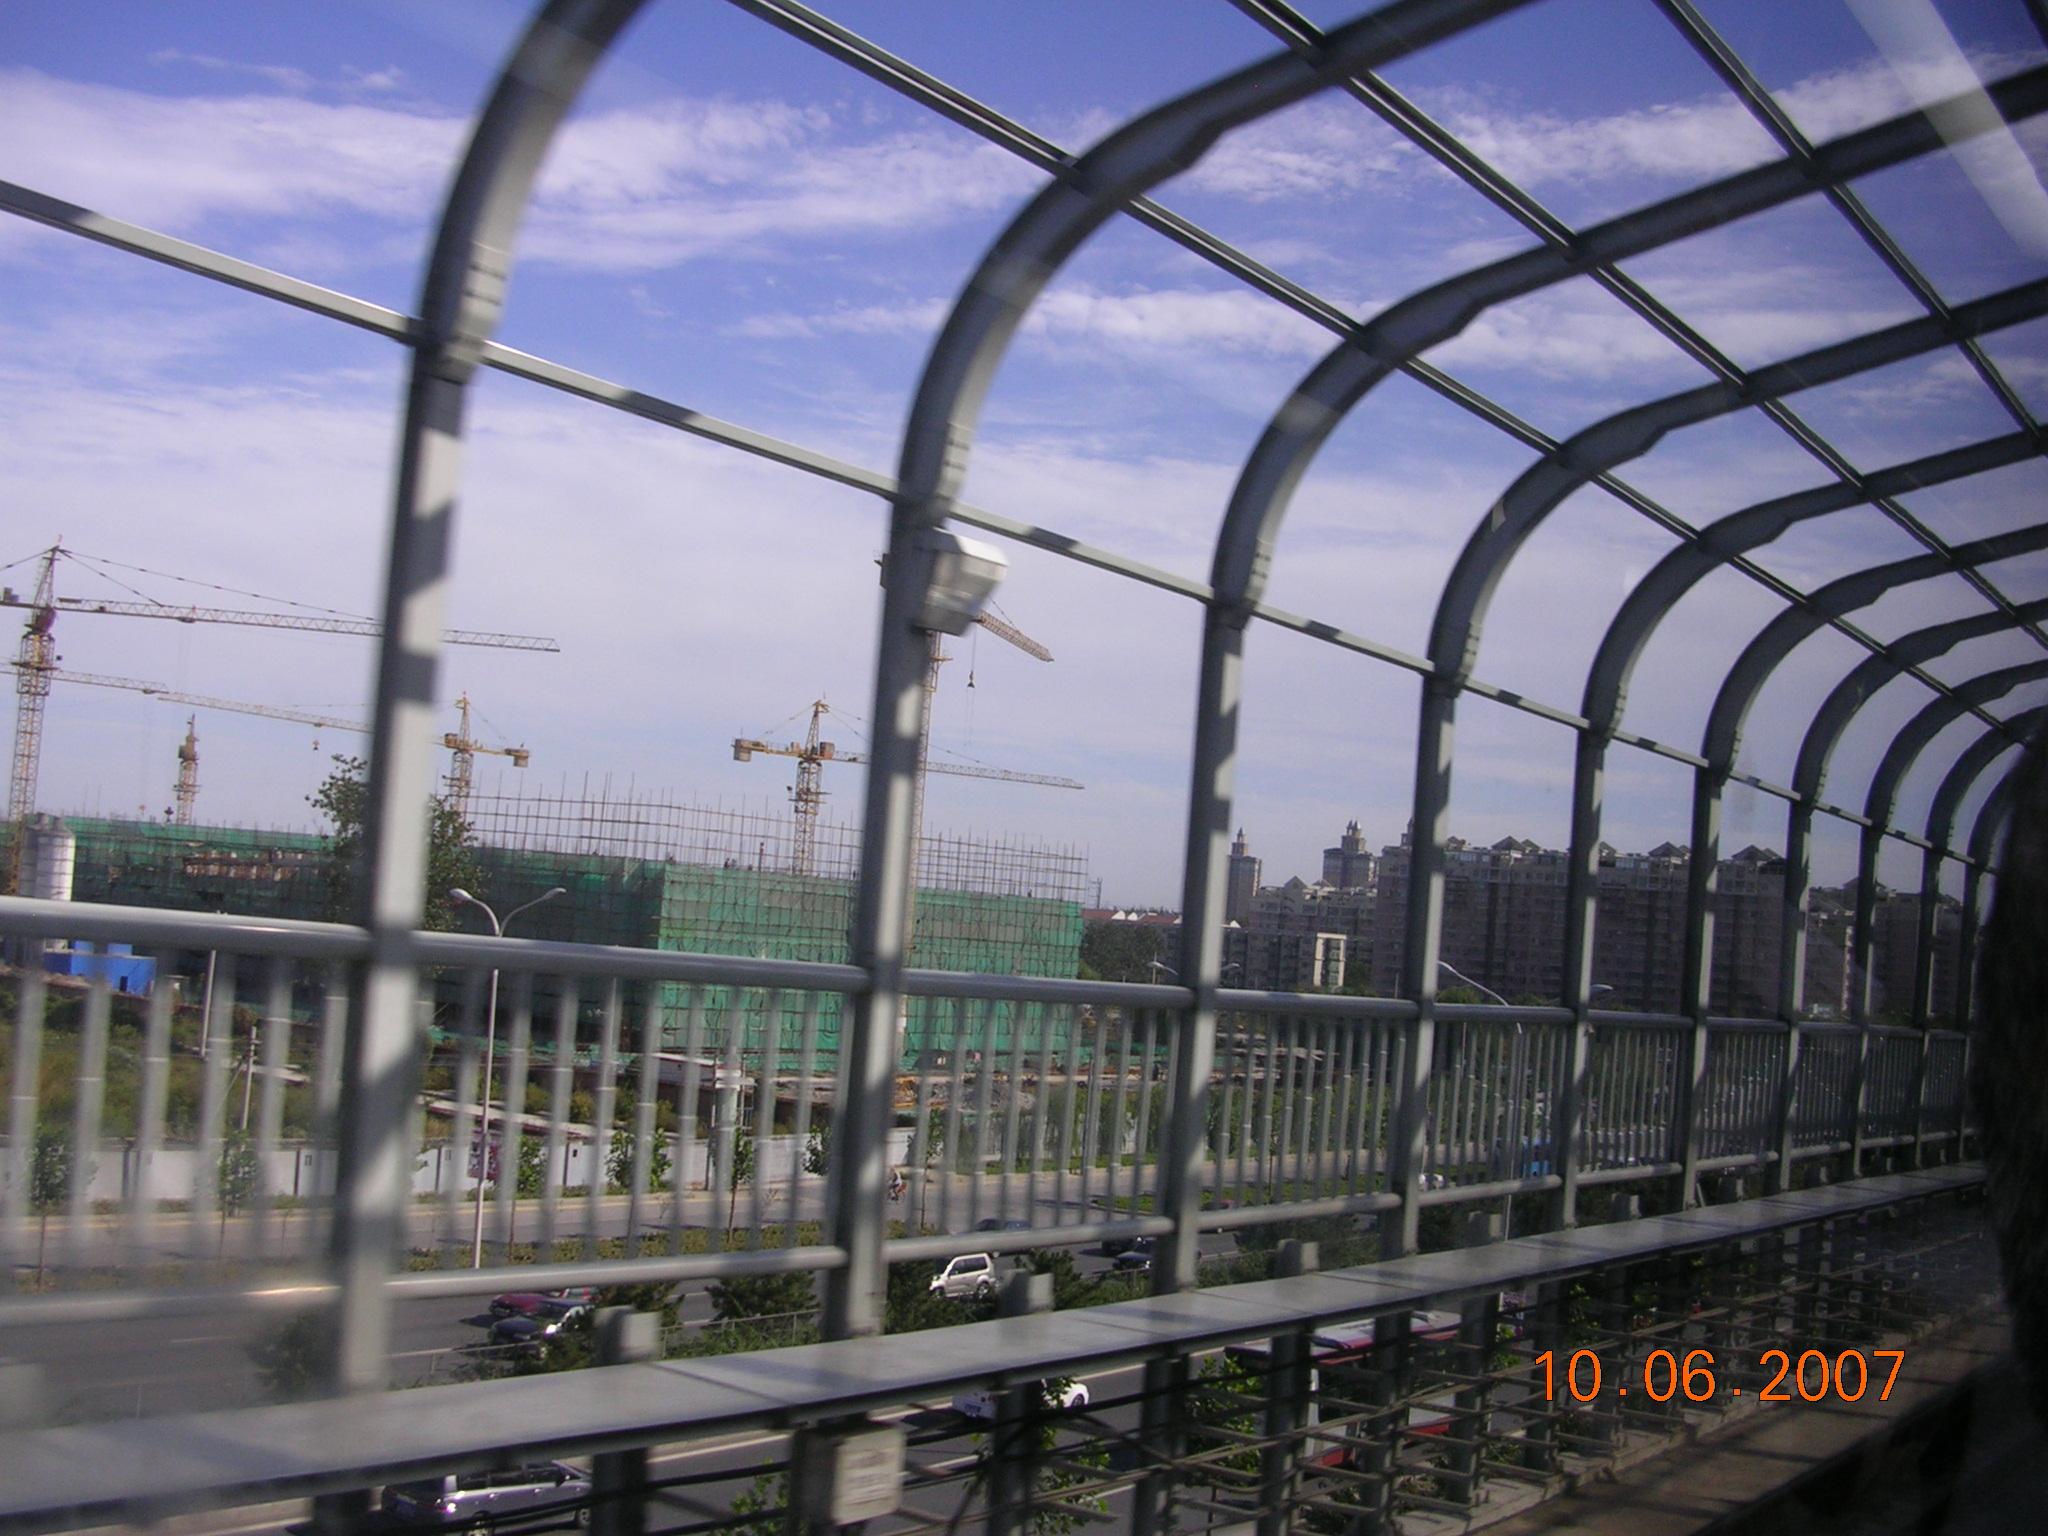 2007-10-07A 036.jpg